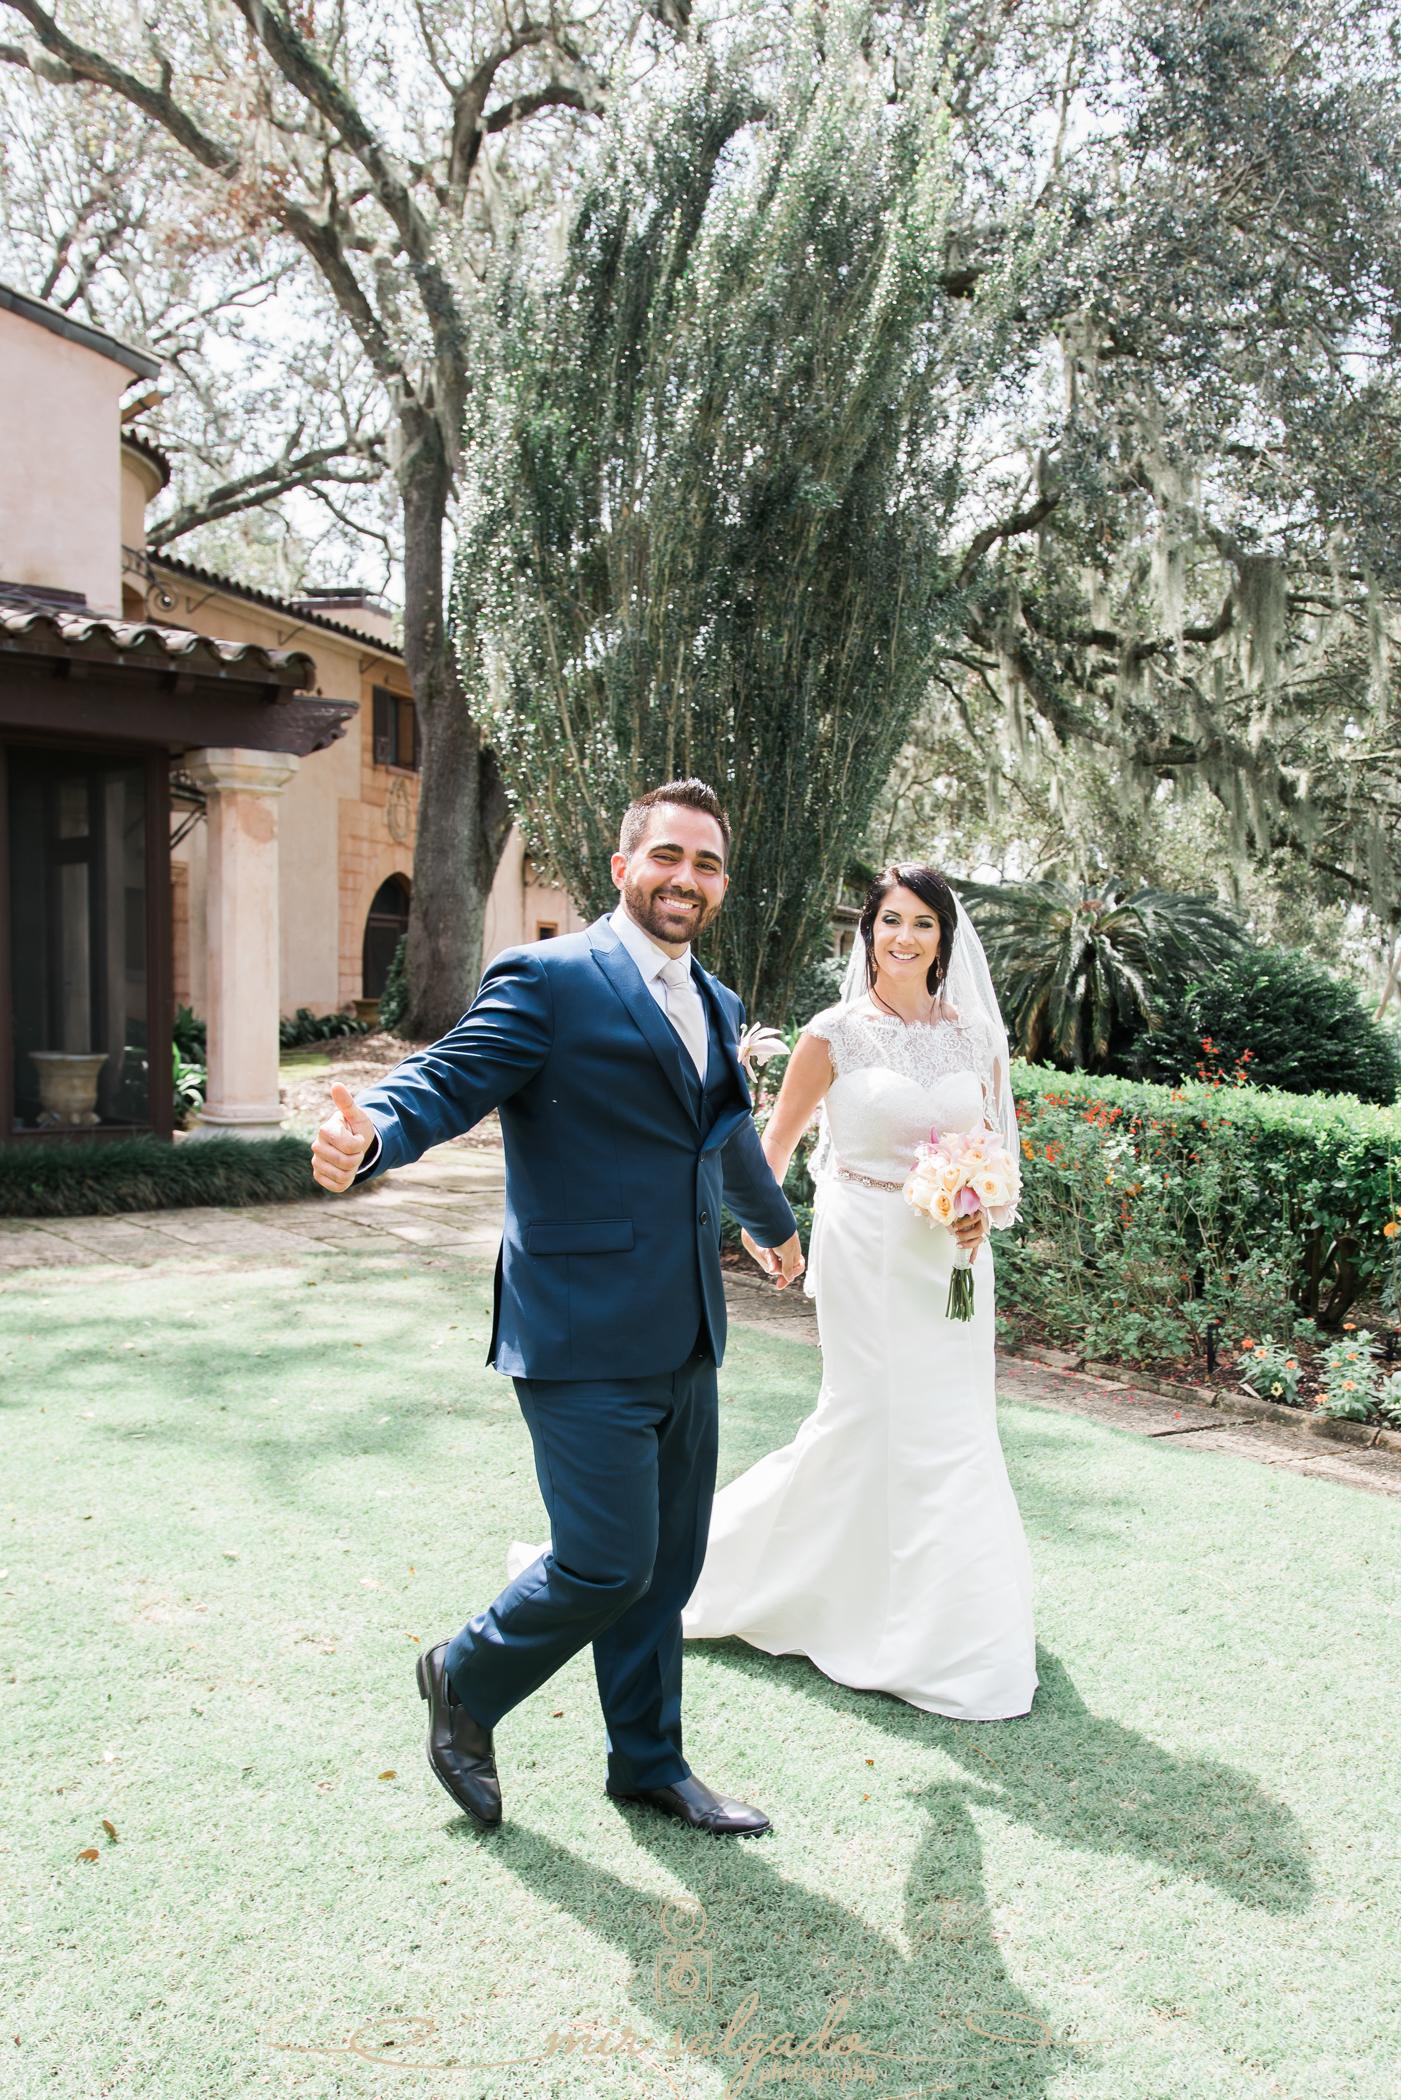 Bok-tower-wedding-photo, bride-and-groom-portrait